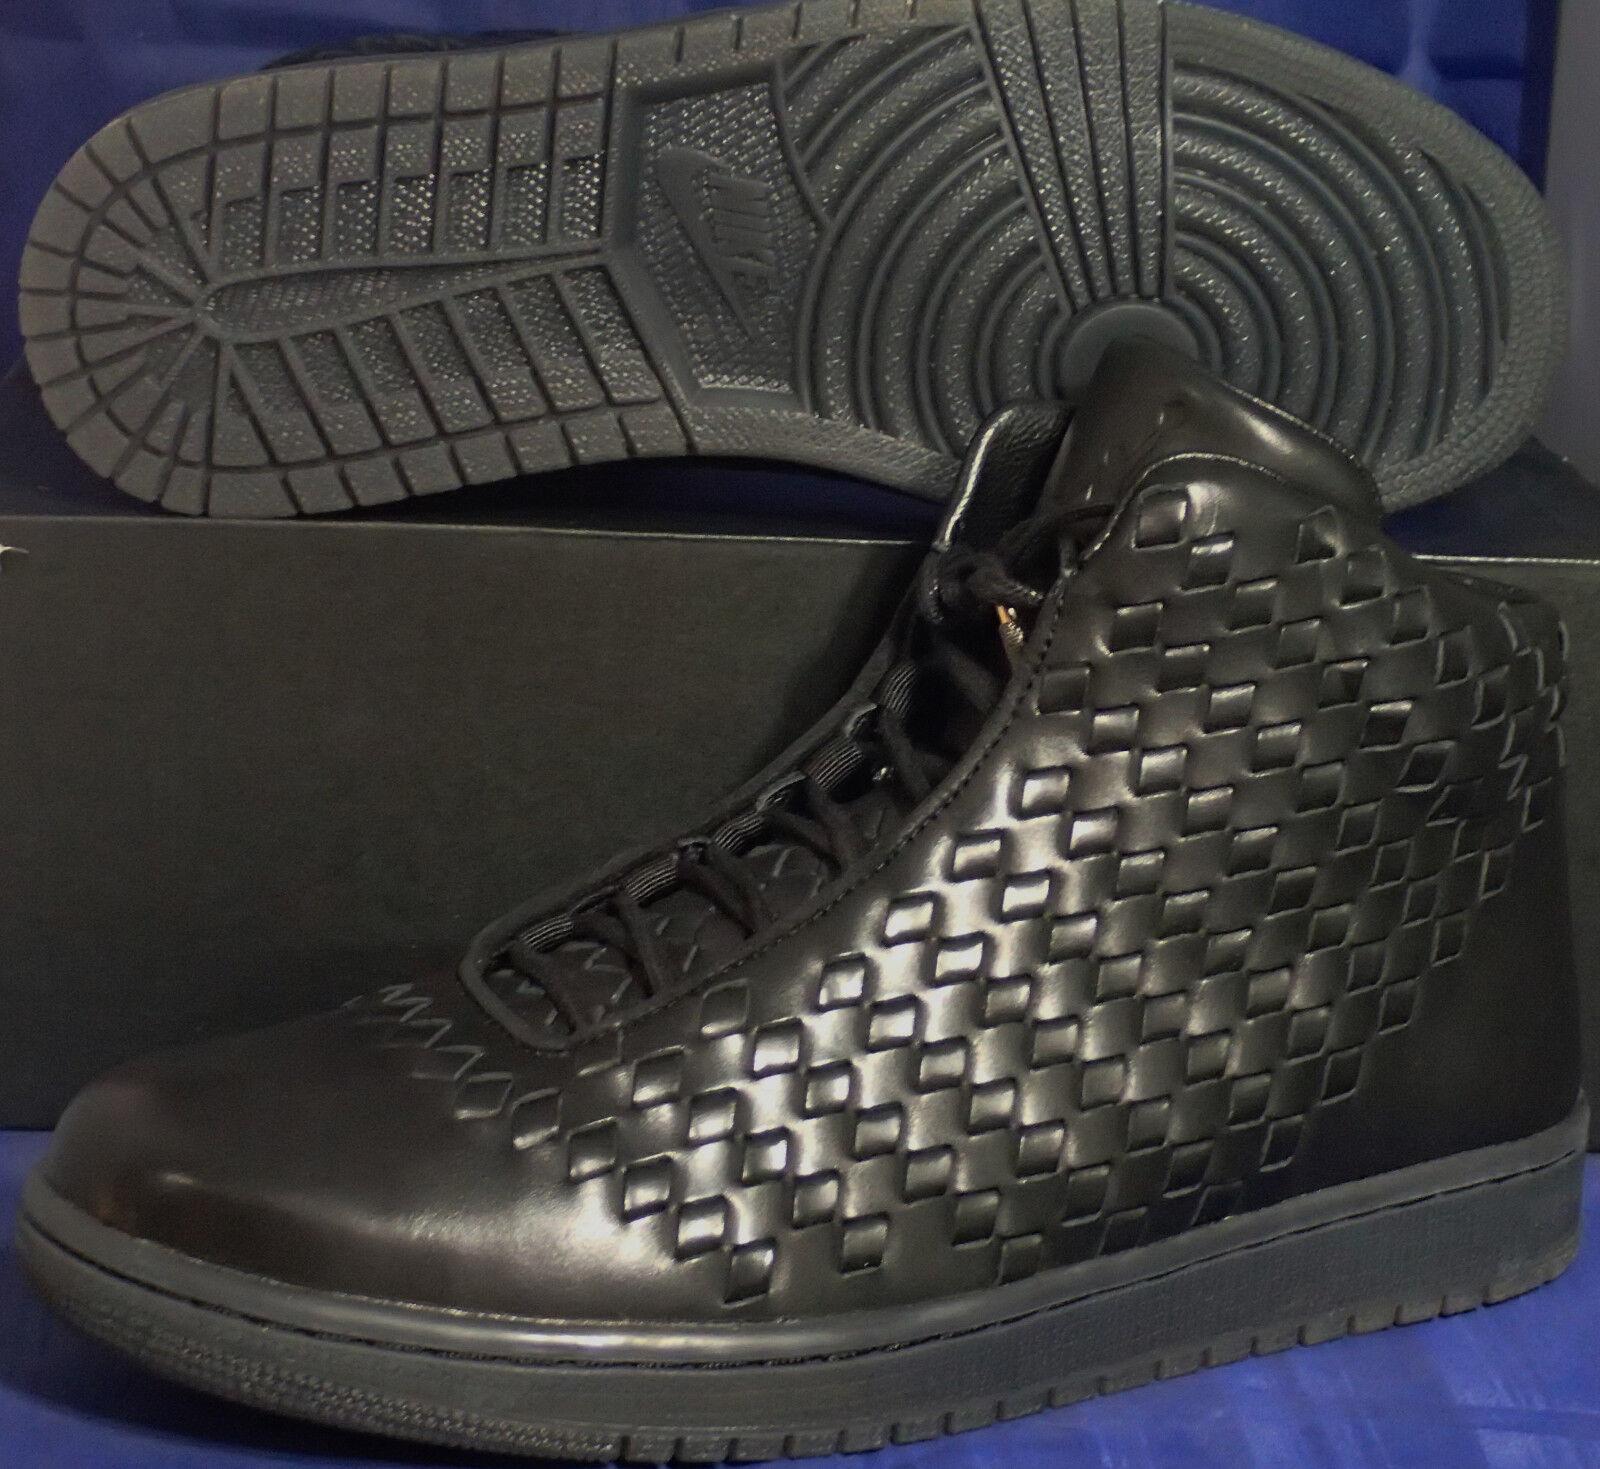 Nike Jordan Shine 689480-010 Black SZ 10.5 ( 689480-010 Shine ) 05858b